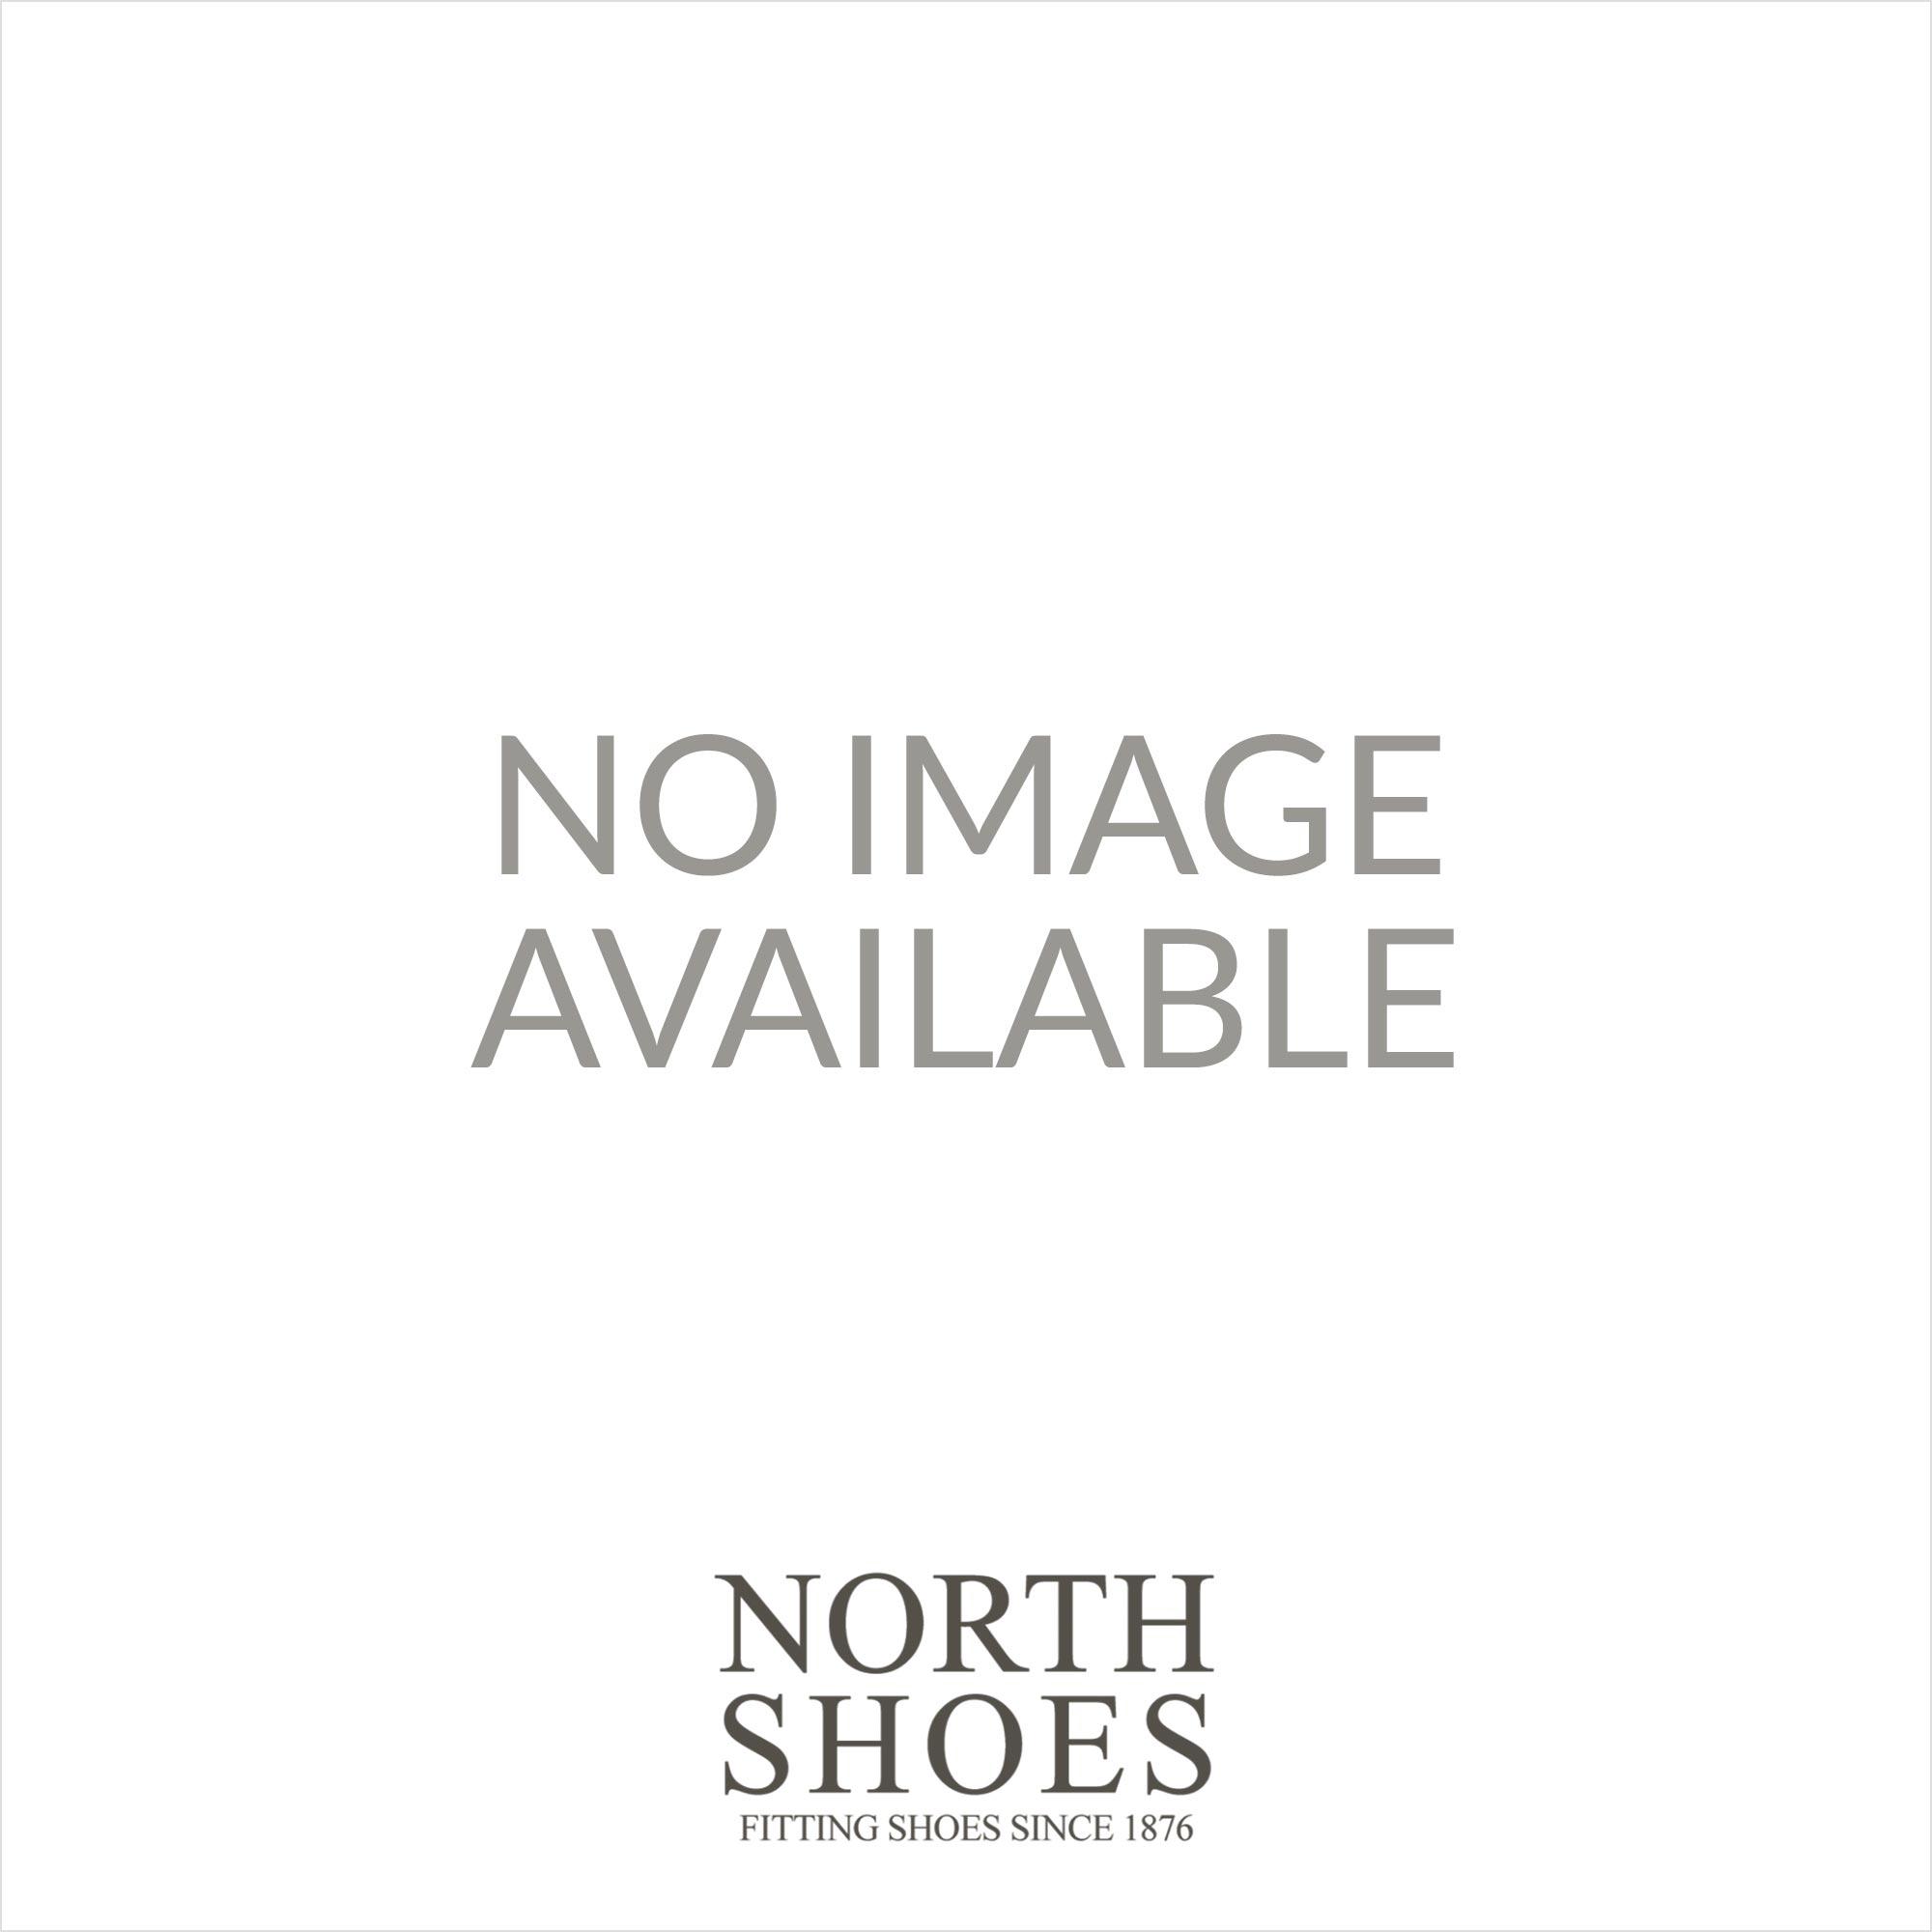 Tamaris 29313 20 White Leather Womens Slingback Wedge Sandals